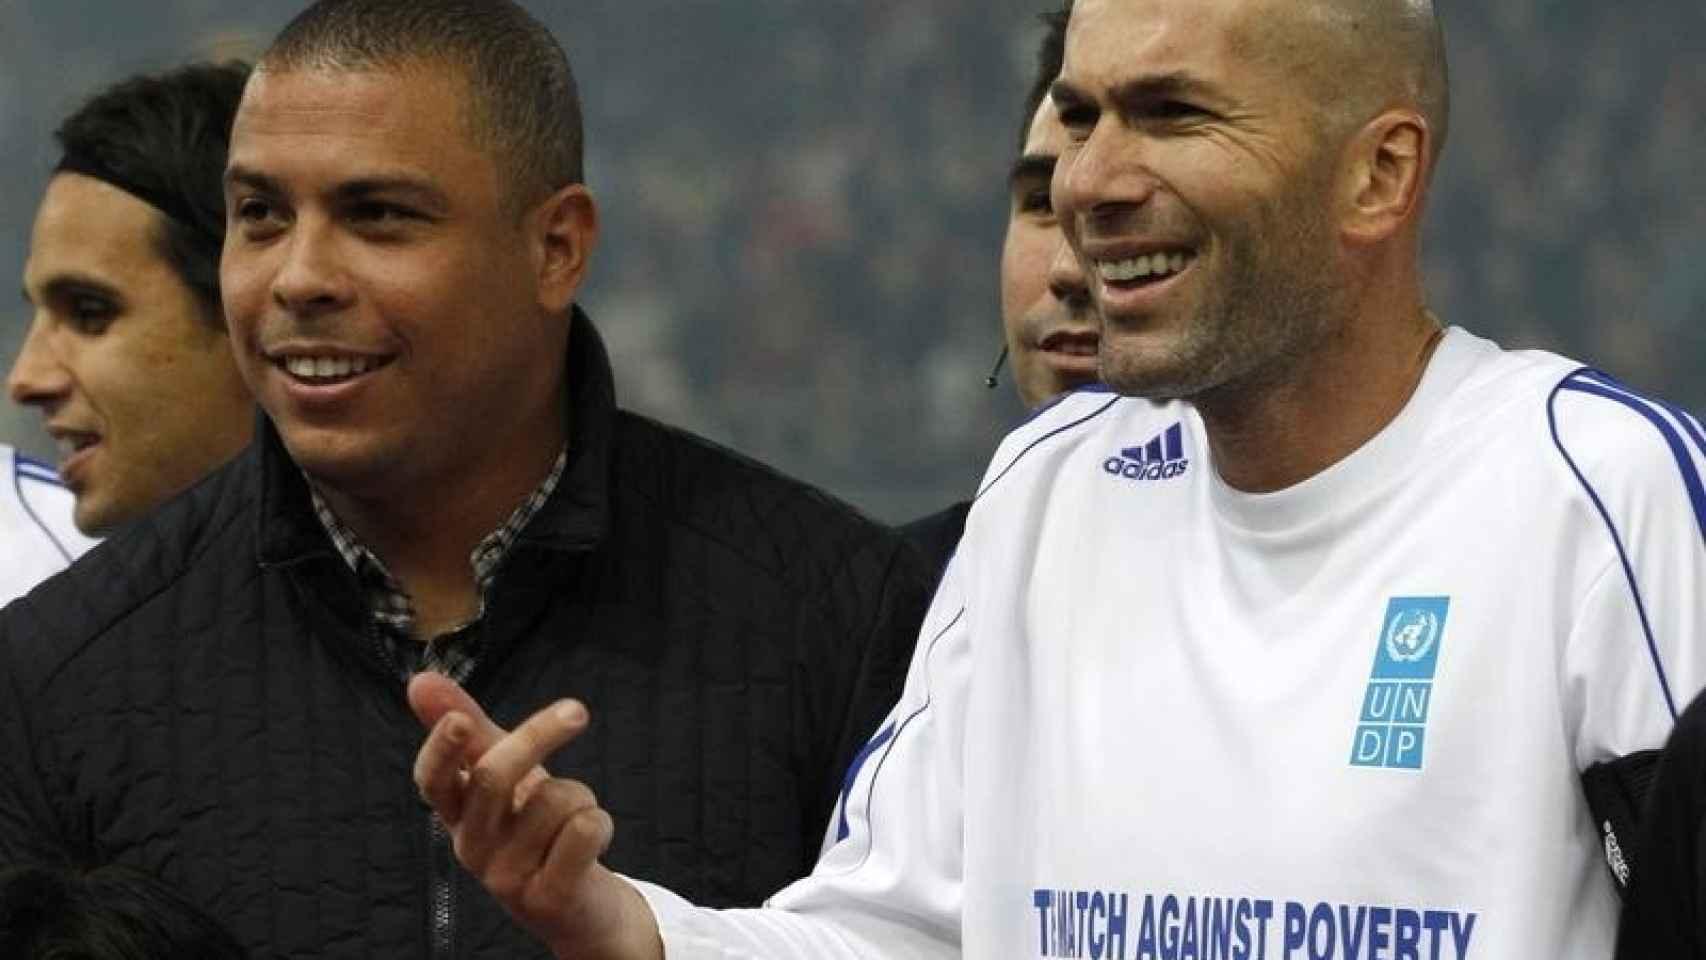 Zinedine Zidane y Ronaldo Nazario